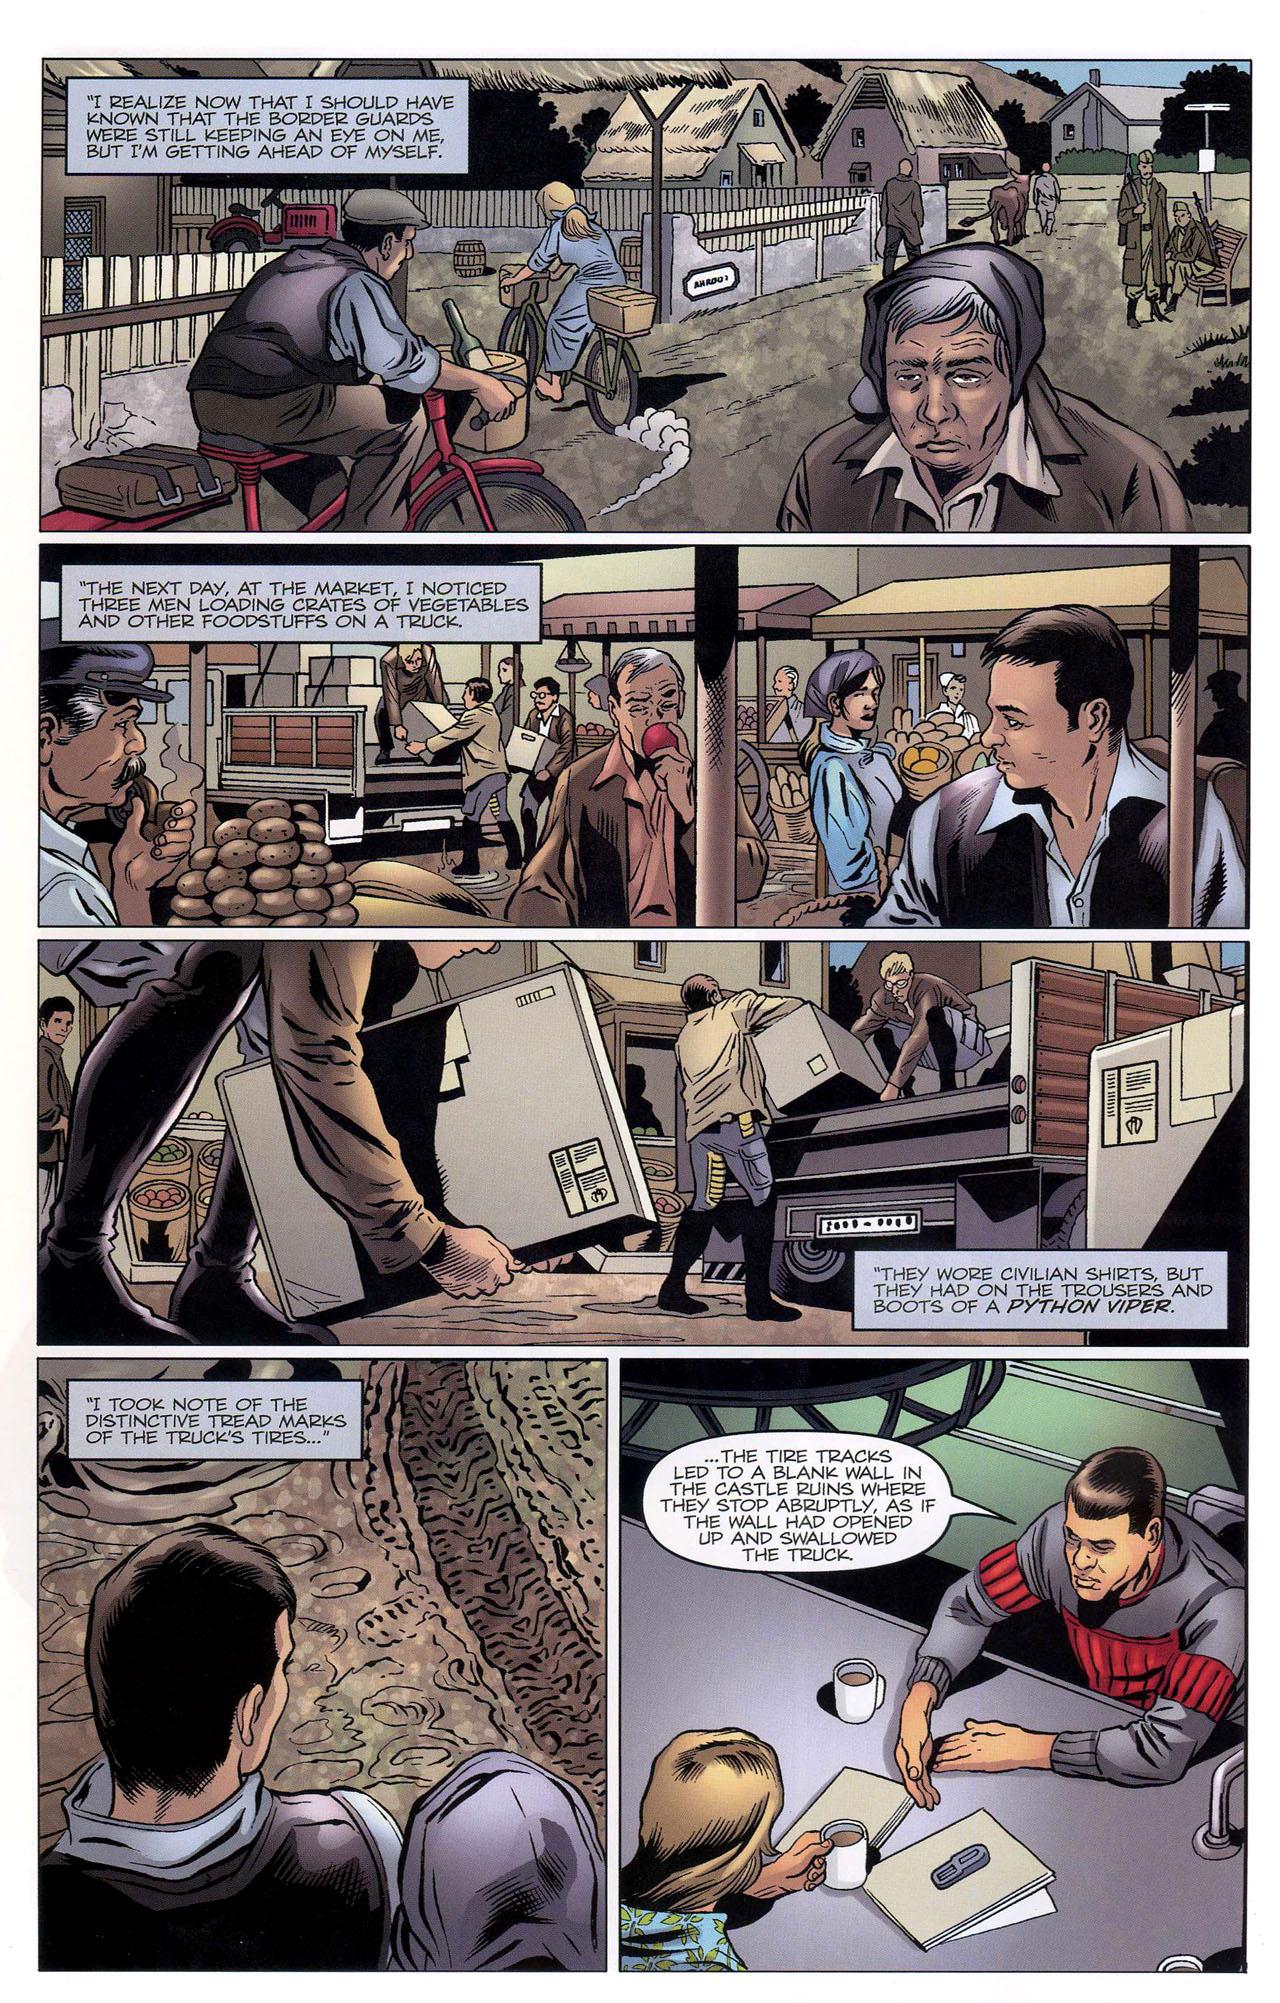 G.I. Joe: A Real American Hero 171 Page 12